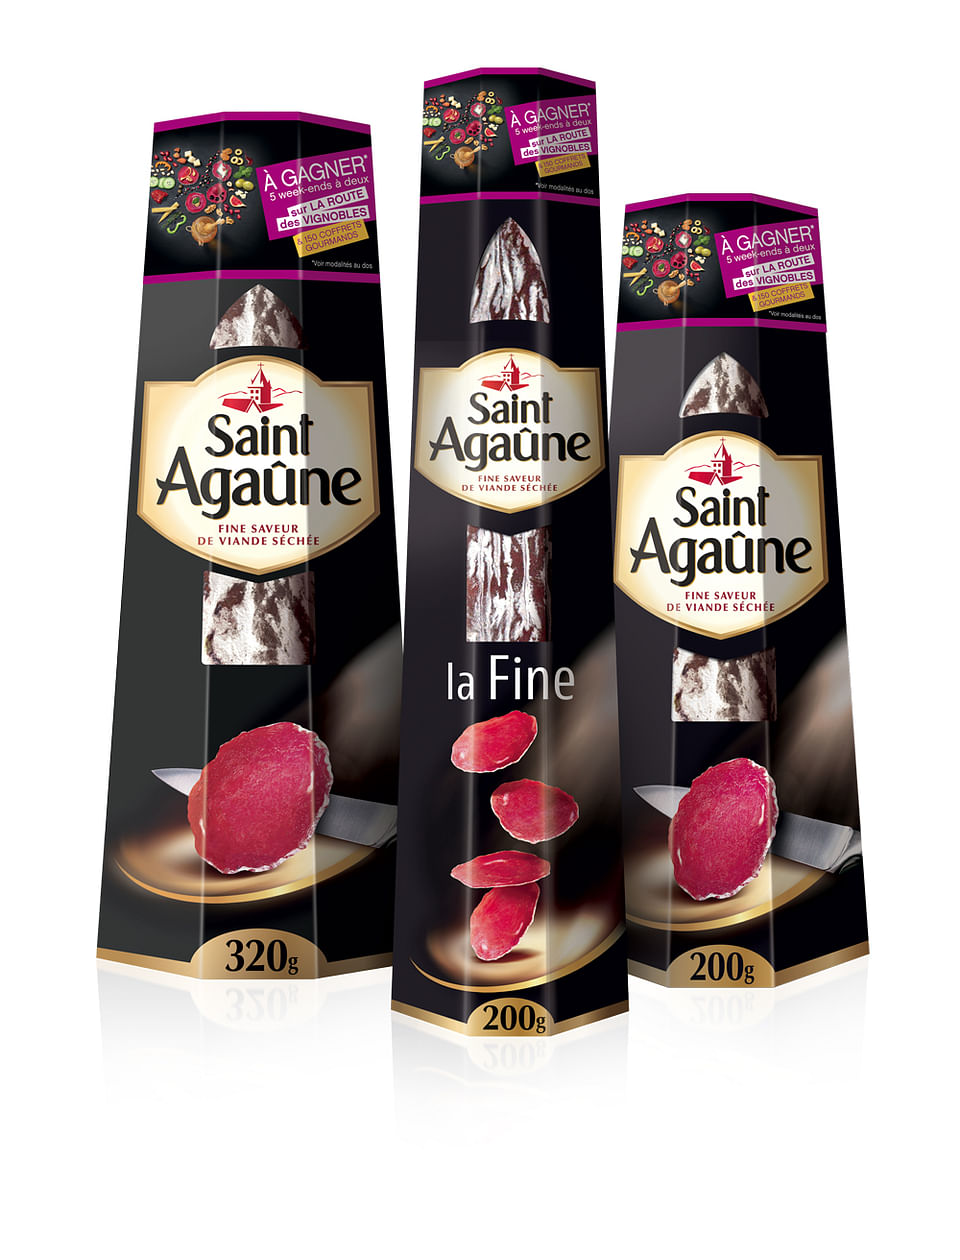 Saint Agaune Brand activation